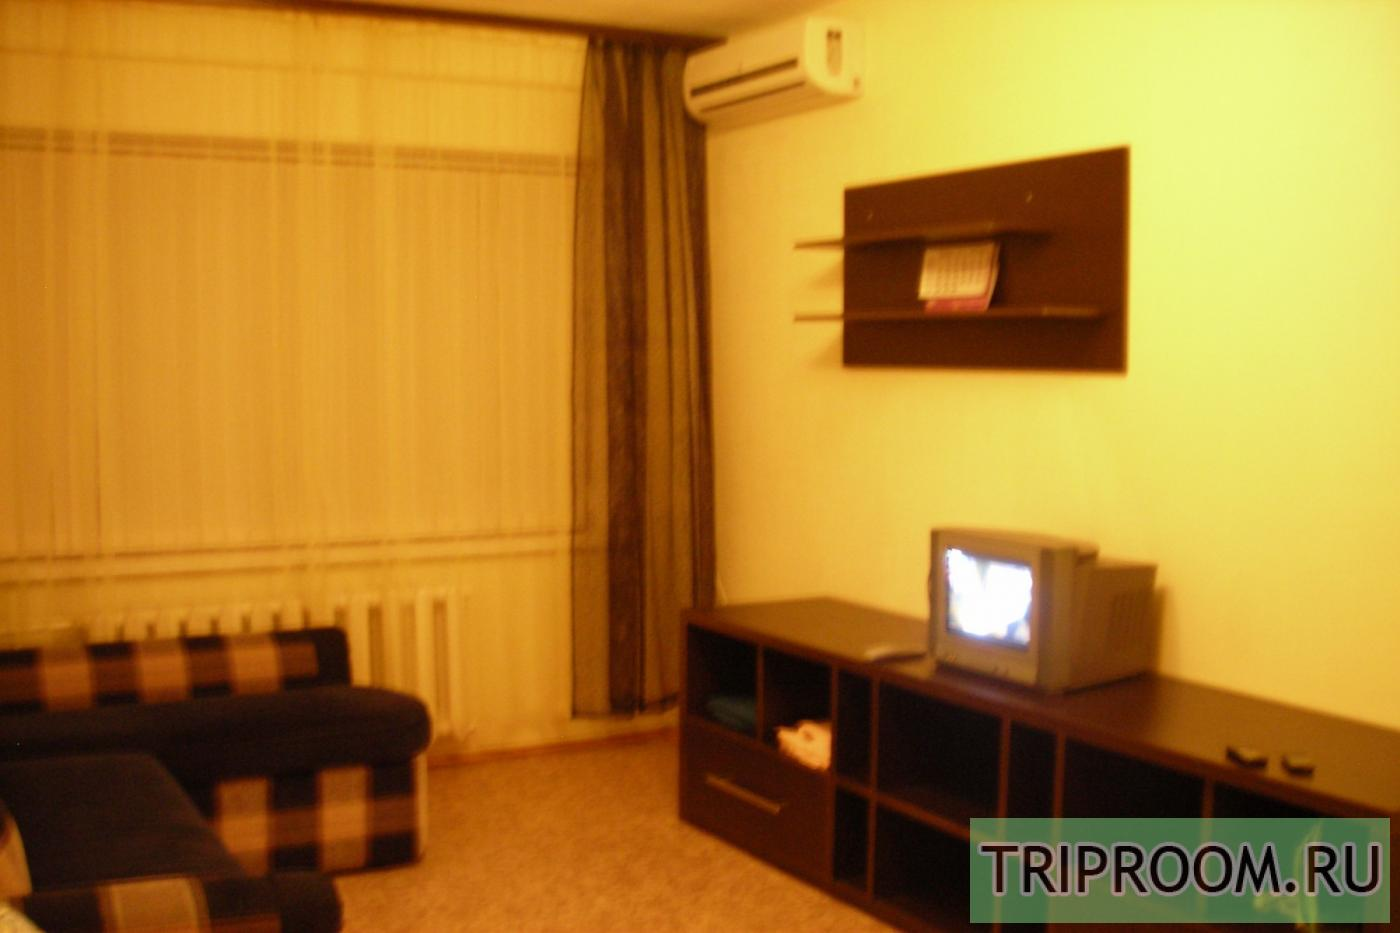 1-комнатная квартира посуточно (вариант № 18159), ул. Московский проспект, фото № 2